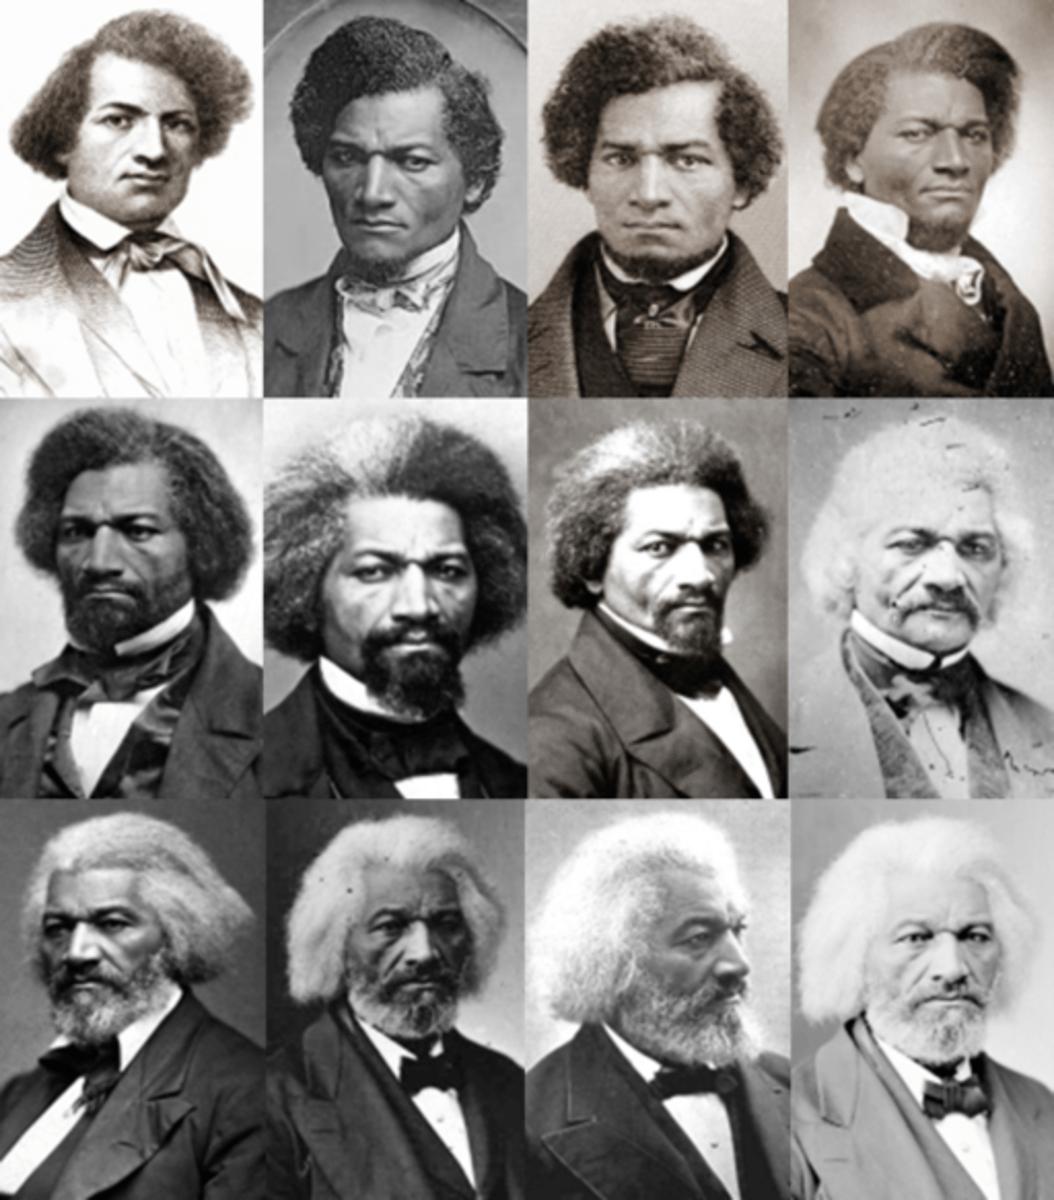 Biography Of Social Reformer Frederick Douglass